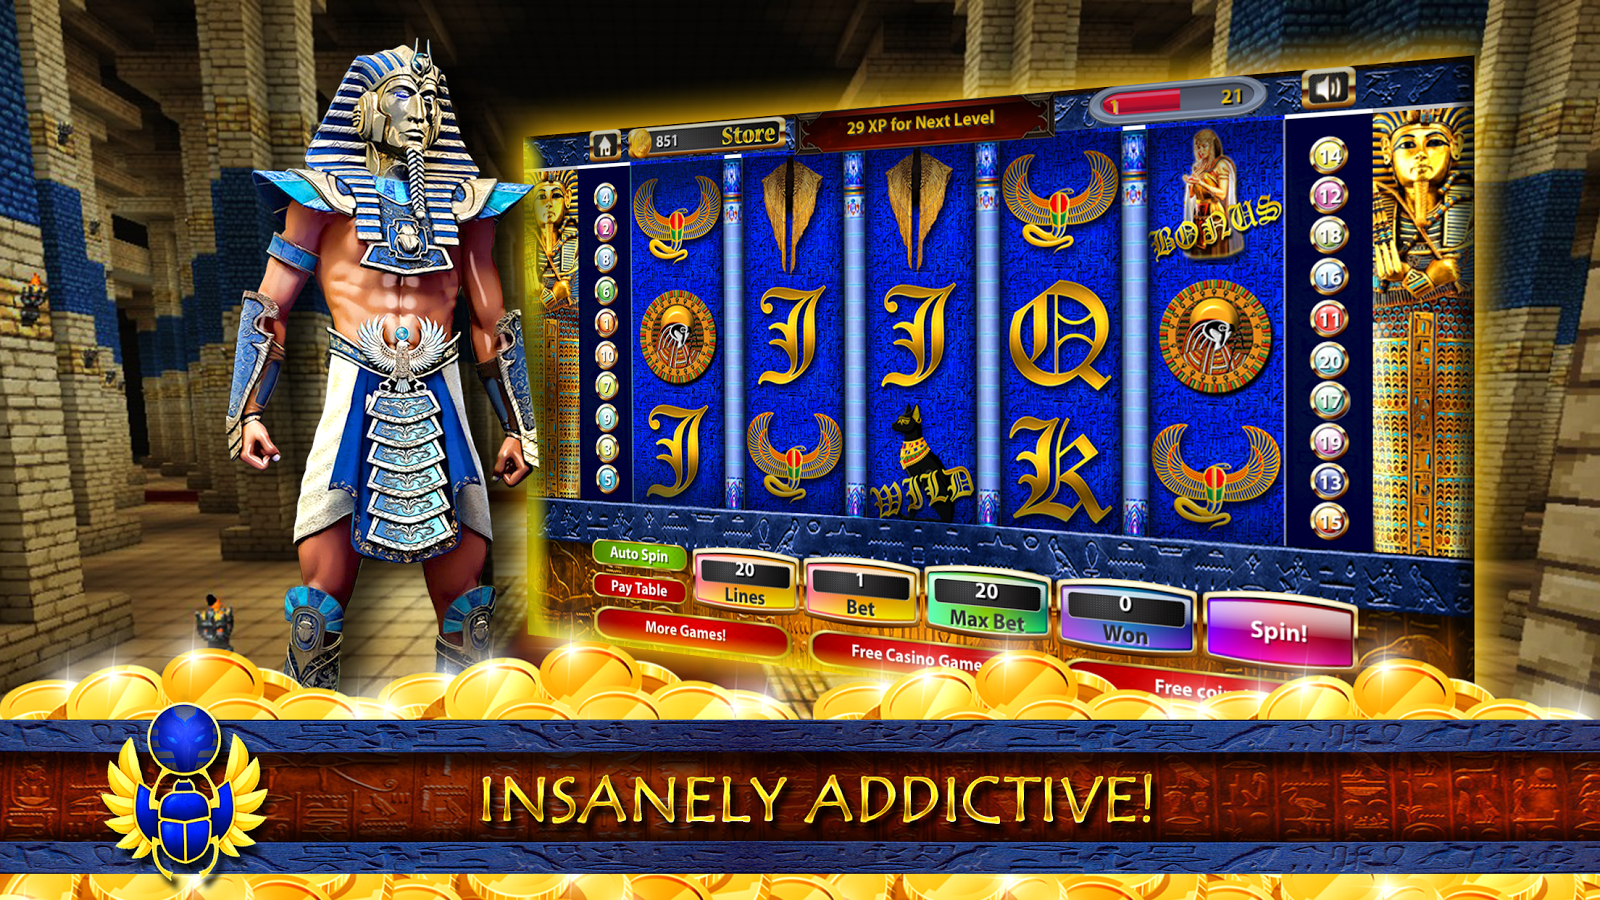 slot games free play online cleopatra bilder